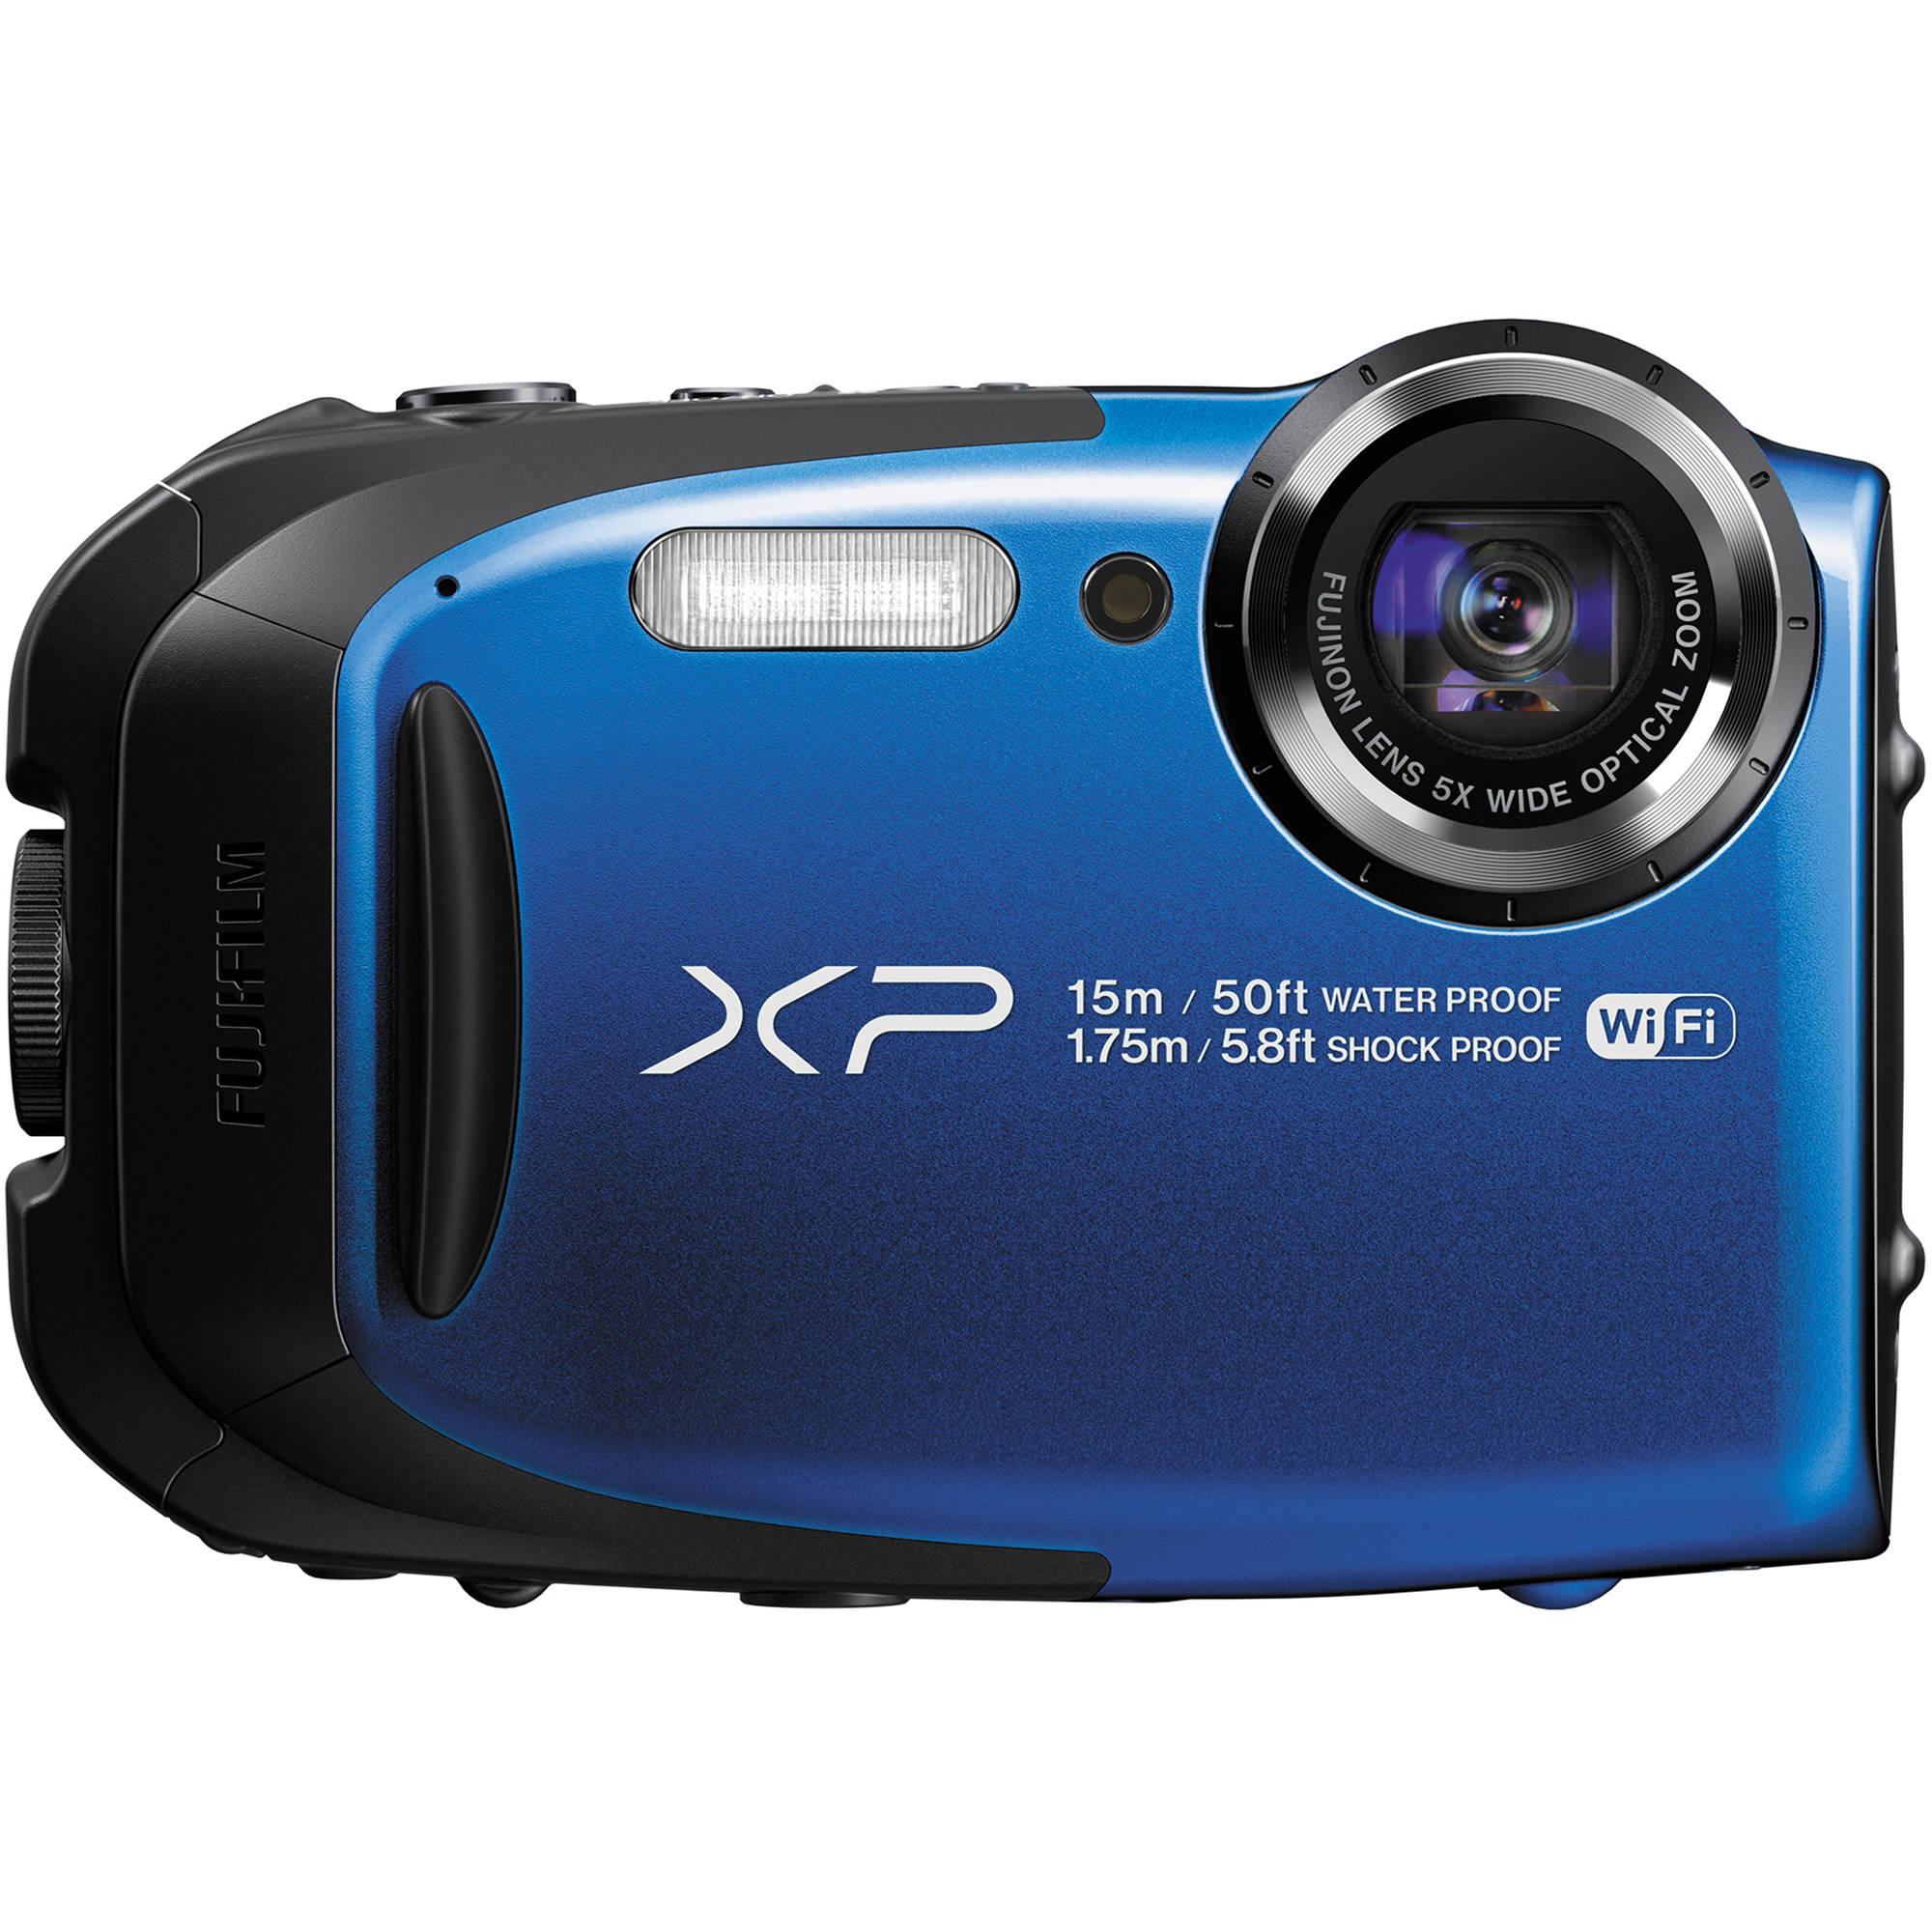 Fuji Digital Cameras: FUJIFILM FinePix XP80 Digital Camera (Blue) 16449430 B&H Photo